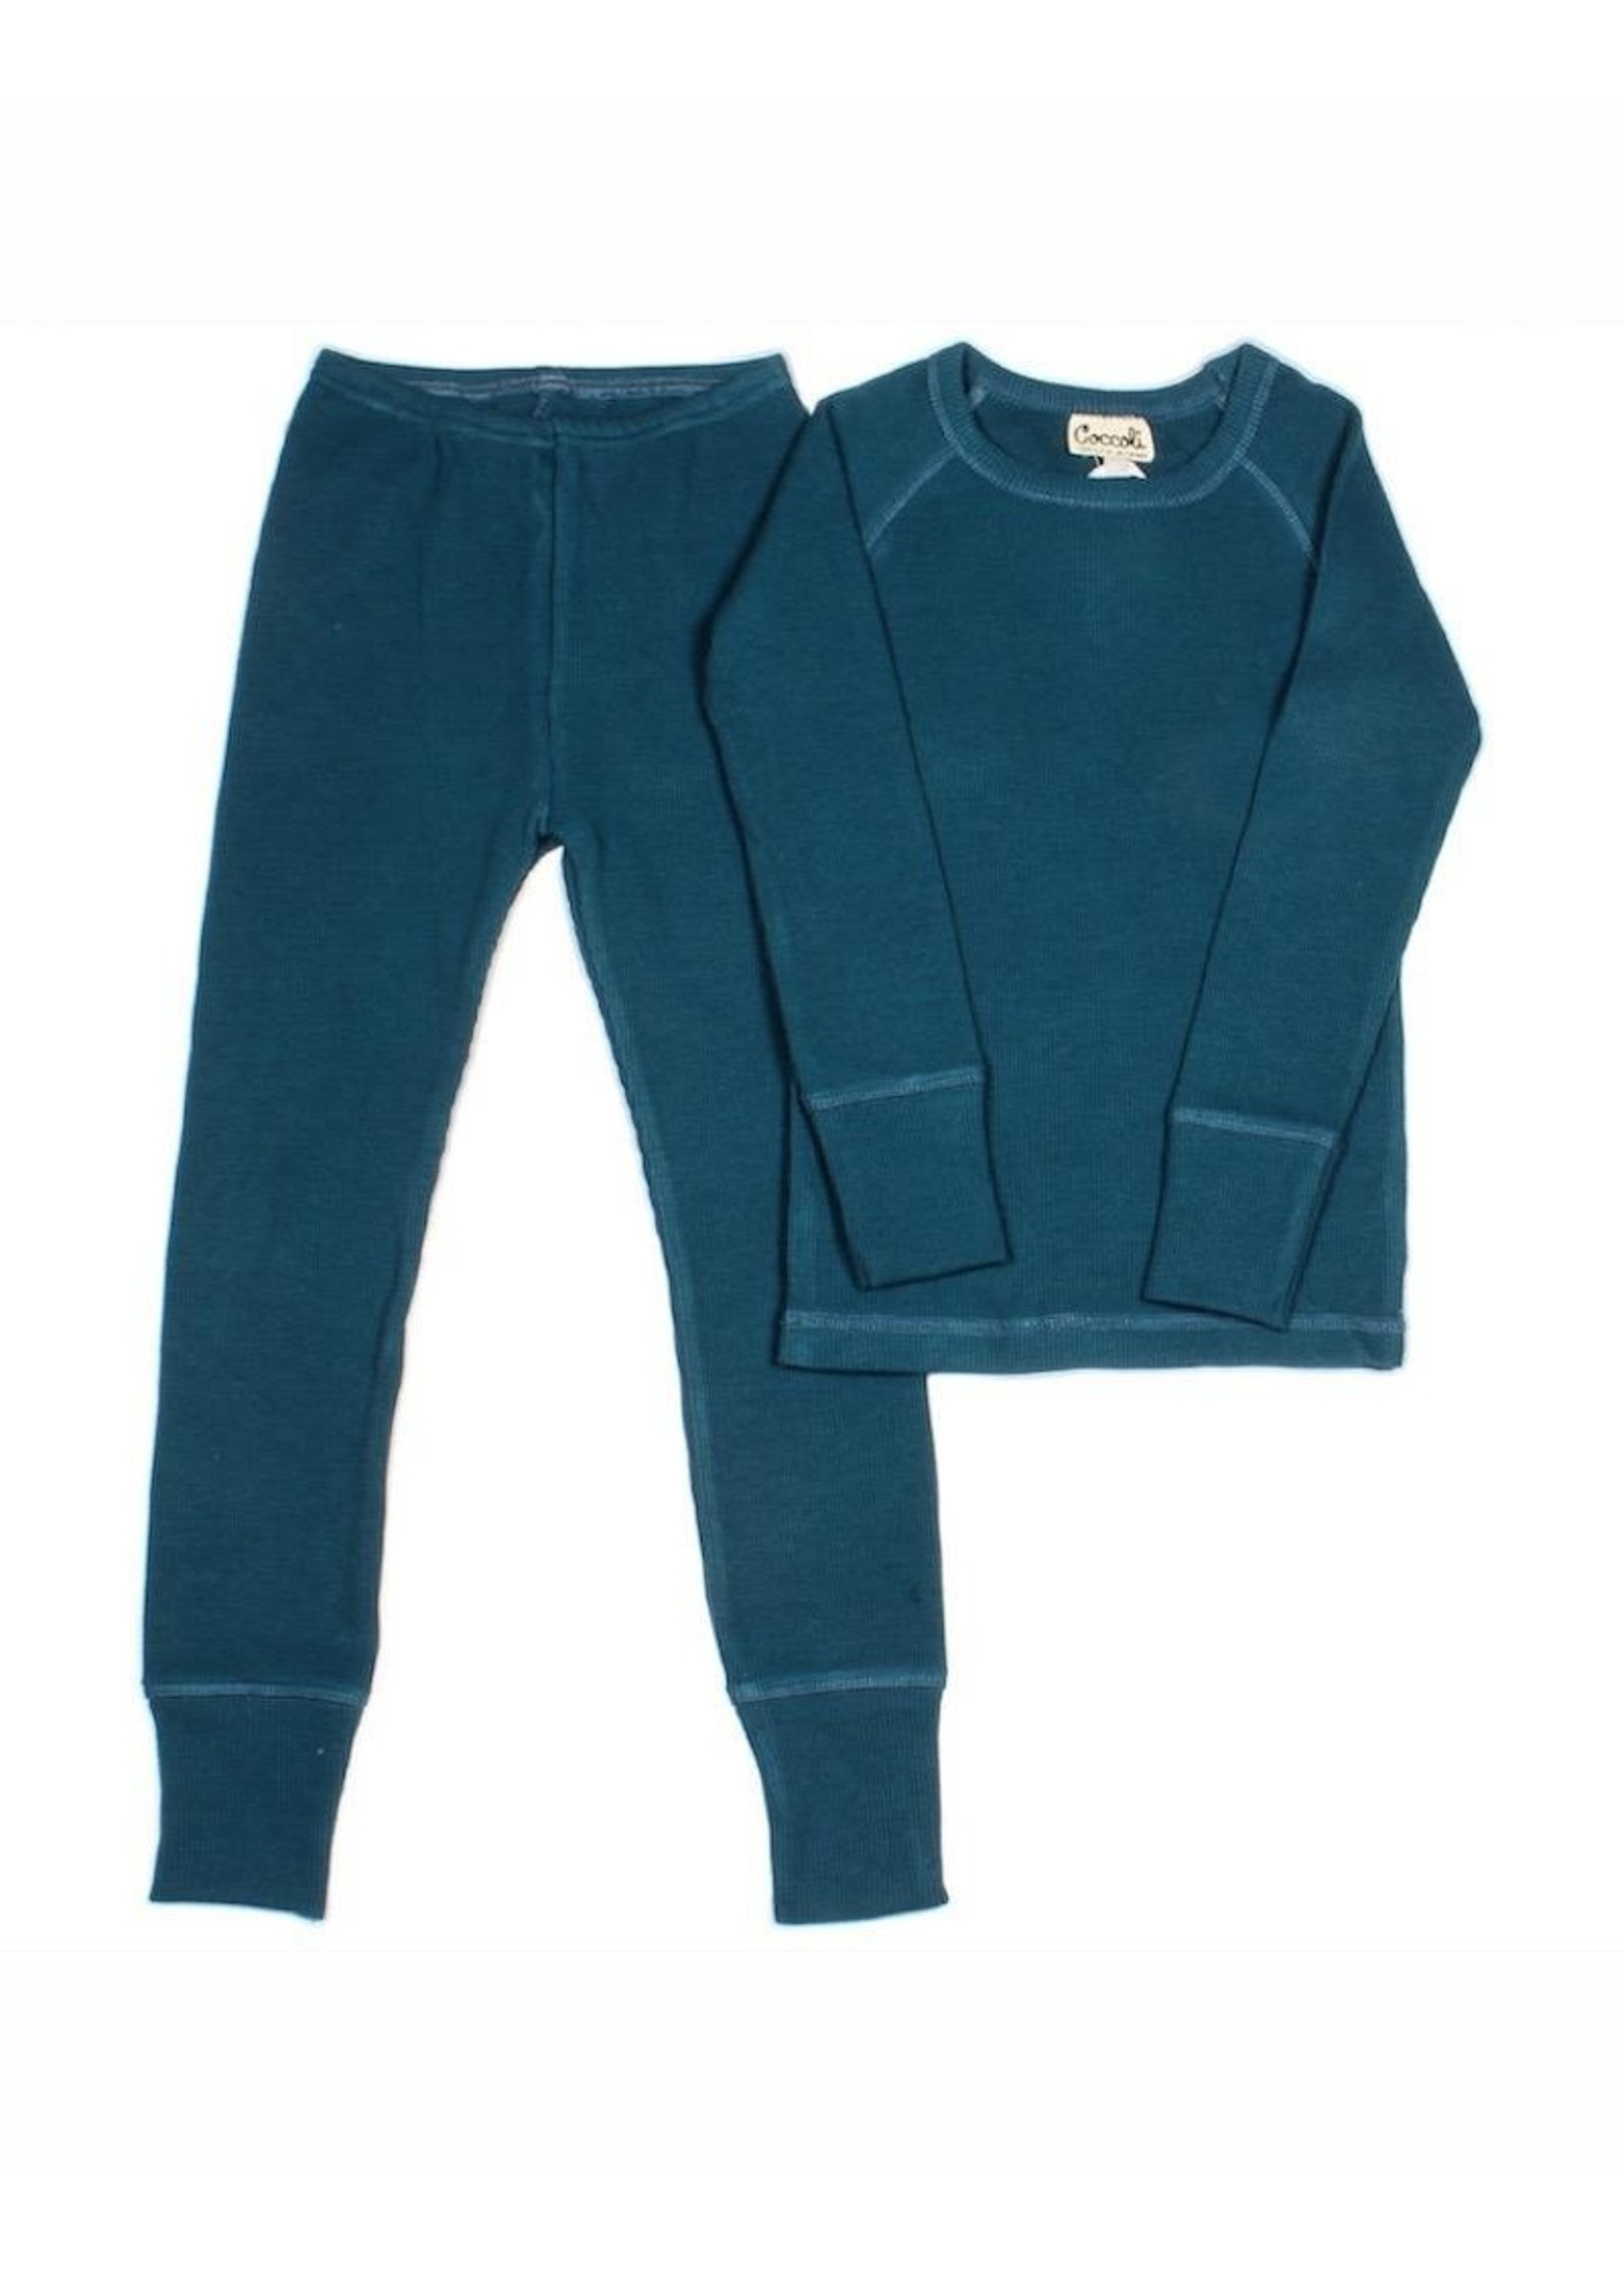 Coccoli Coccoli, Blue Waffle Knit Pajama Set